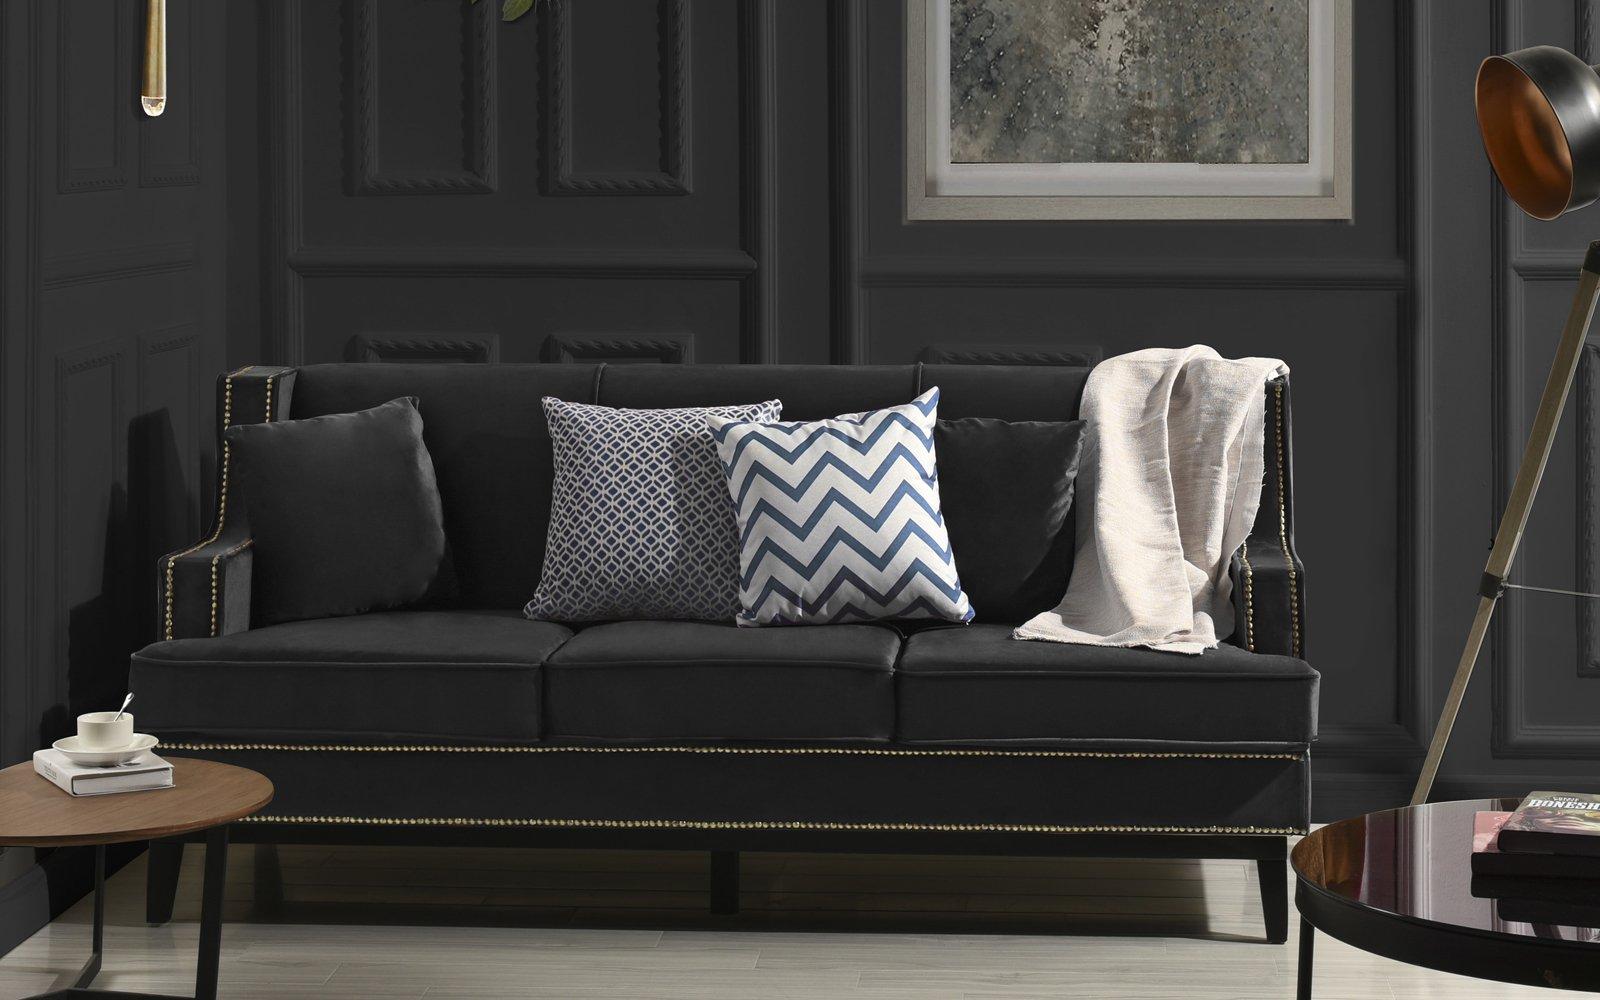 Sensational Black Modern Bonded Leather Sofa With Nailhead Trim Detail Machost Co Dining Chair Design Ideas Machostcouk